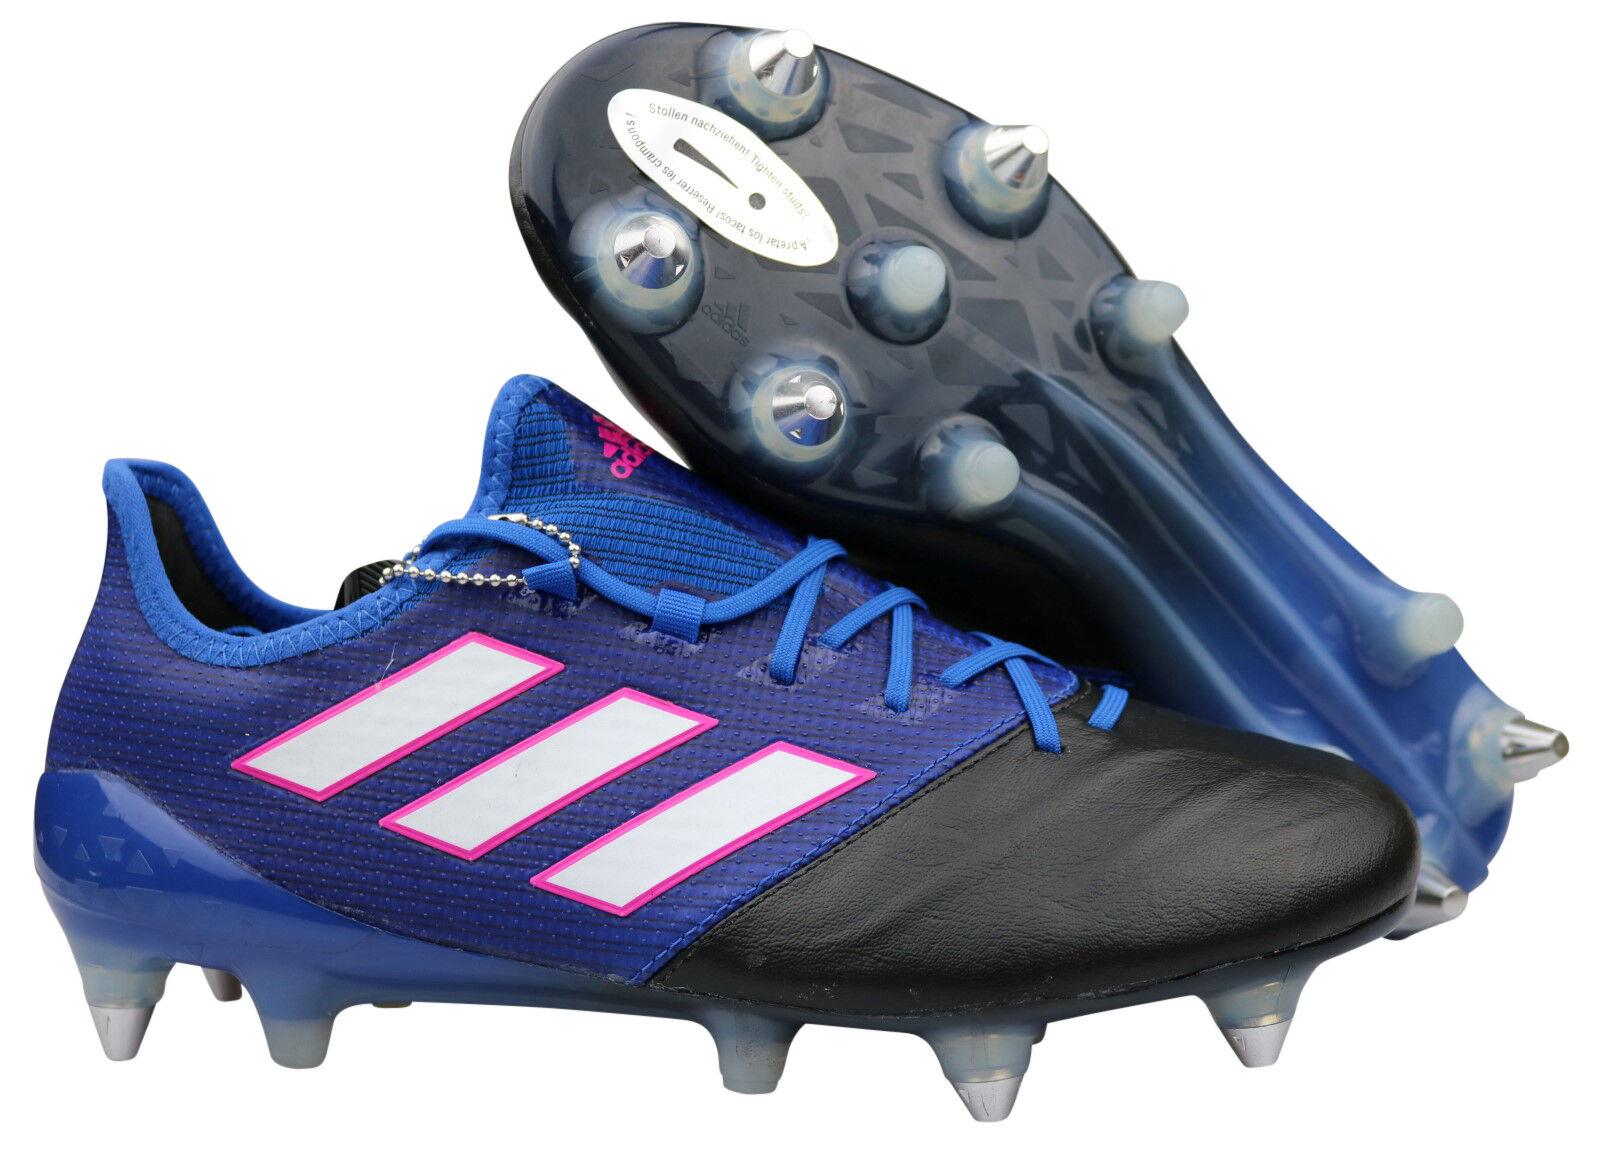 Adidas ACE 17.1 SG SG SG Fußballschuhe Leder Stollen blau BA9192 Gr. 39 - 48 2 3 NEU edef9e